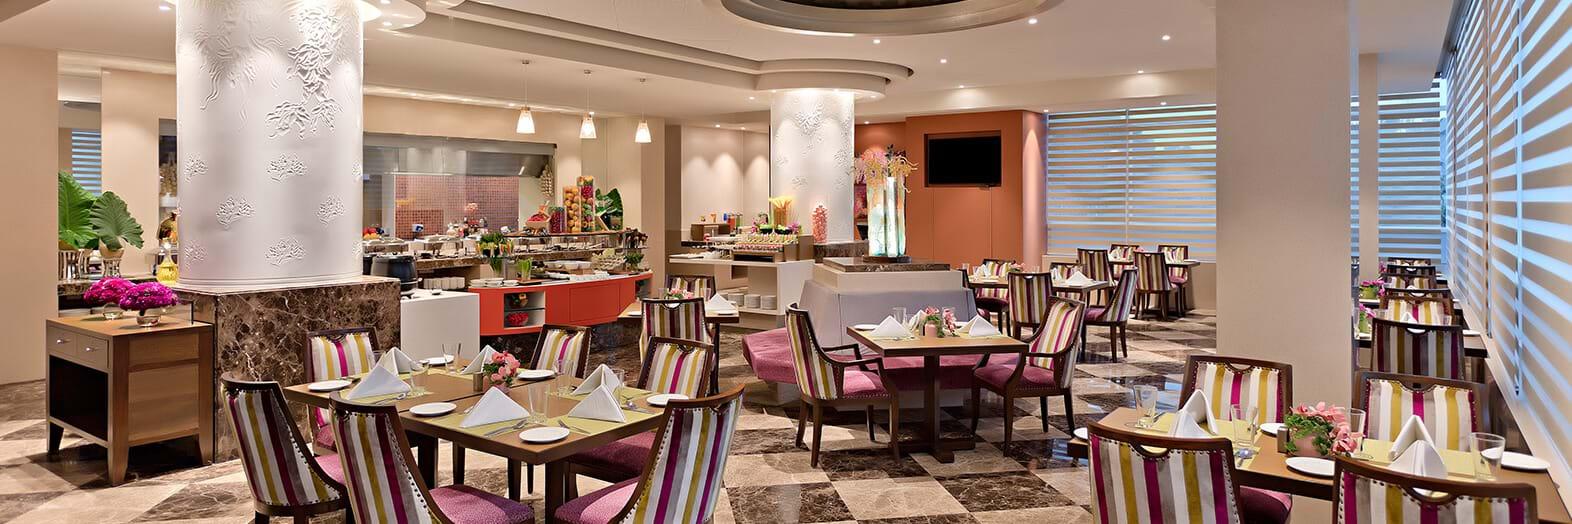 Fortune Park Pushpanjali-Durgapur Hotels Dining